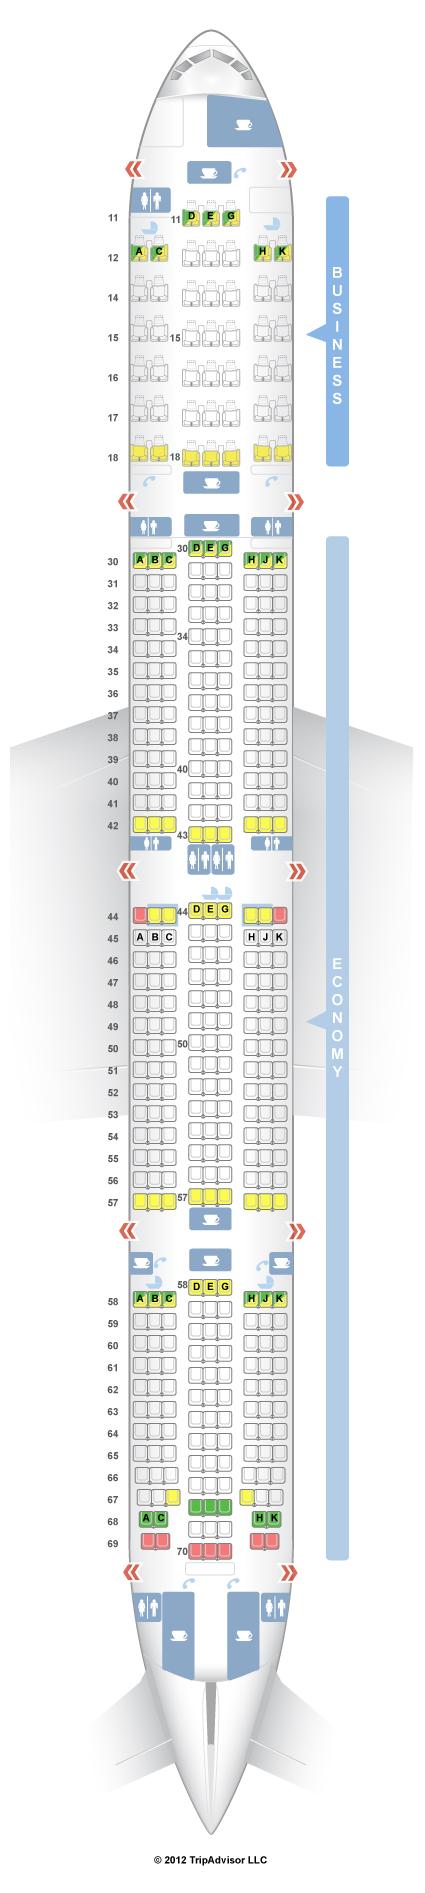 Cathay Pacific Premium Economy Seating Plan 77w - Best ...